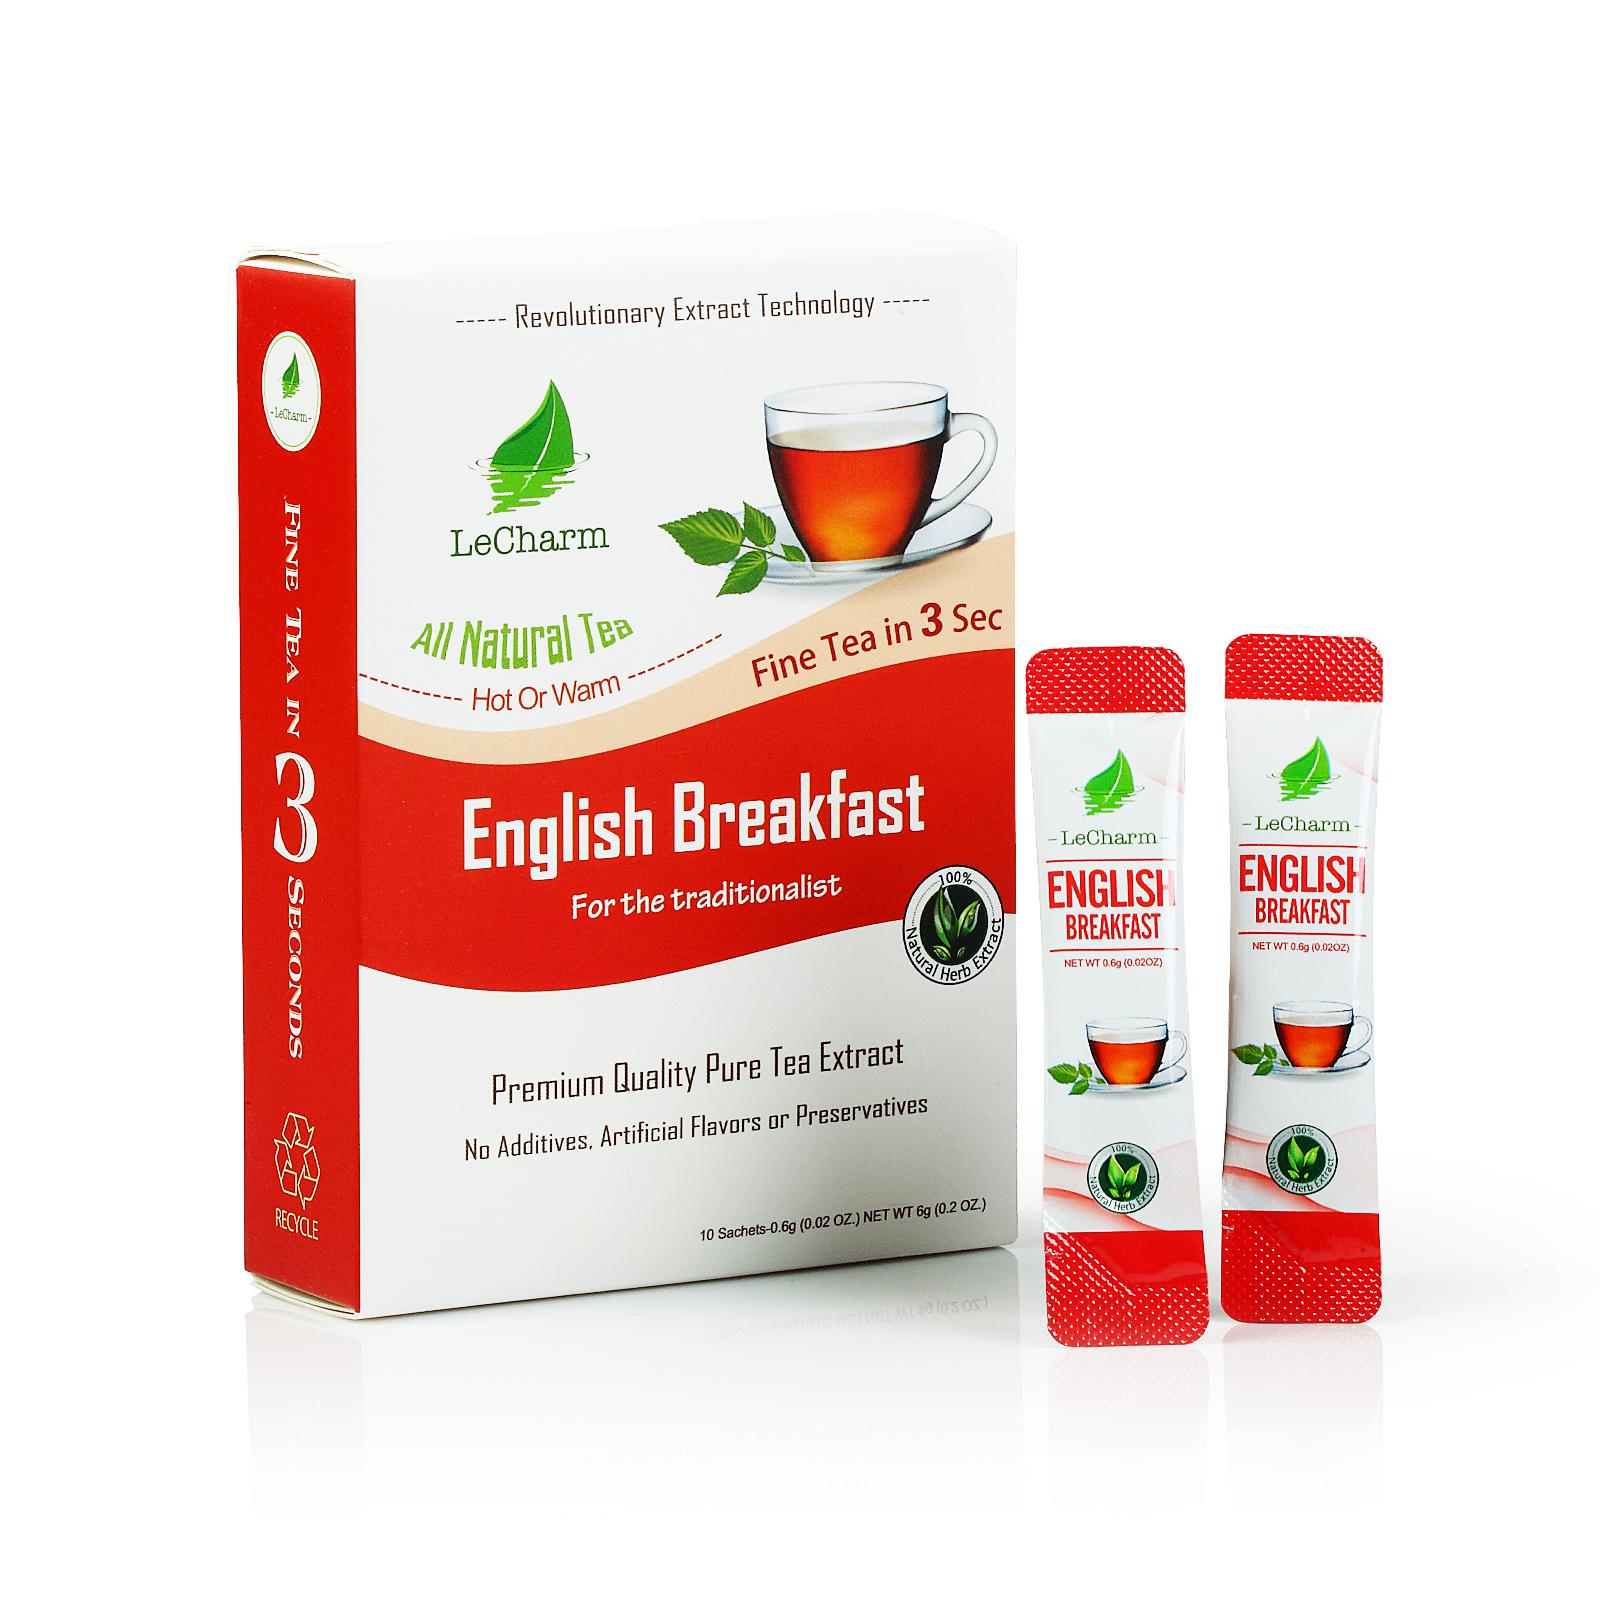 New Arrival High Quality Ceylon Black Tea English Breakfast Tea Private Label Ok FSSC22000 Certified Factory - 4uTea | 4uTea.com